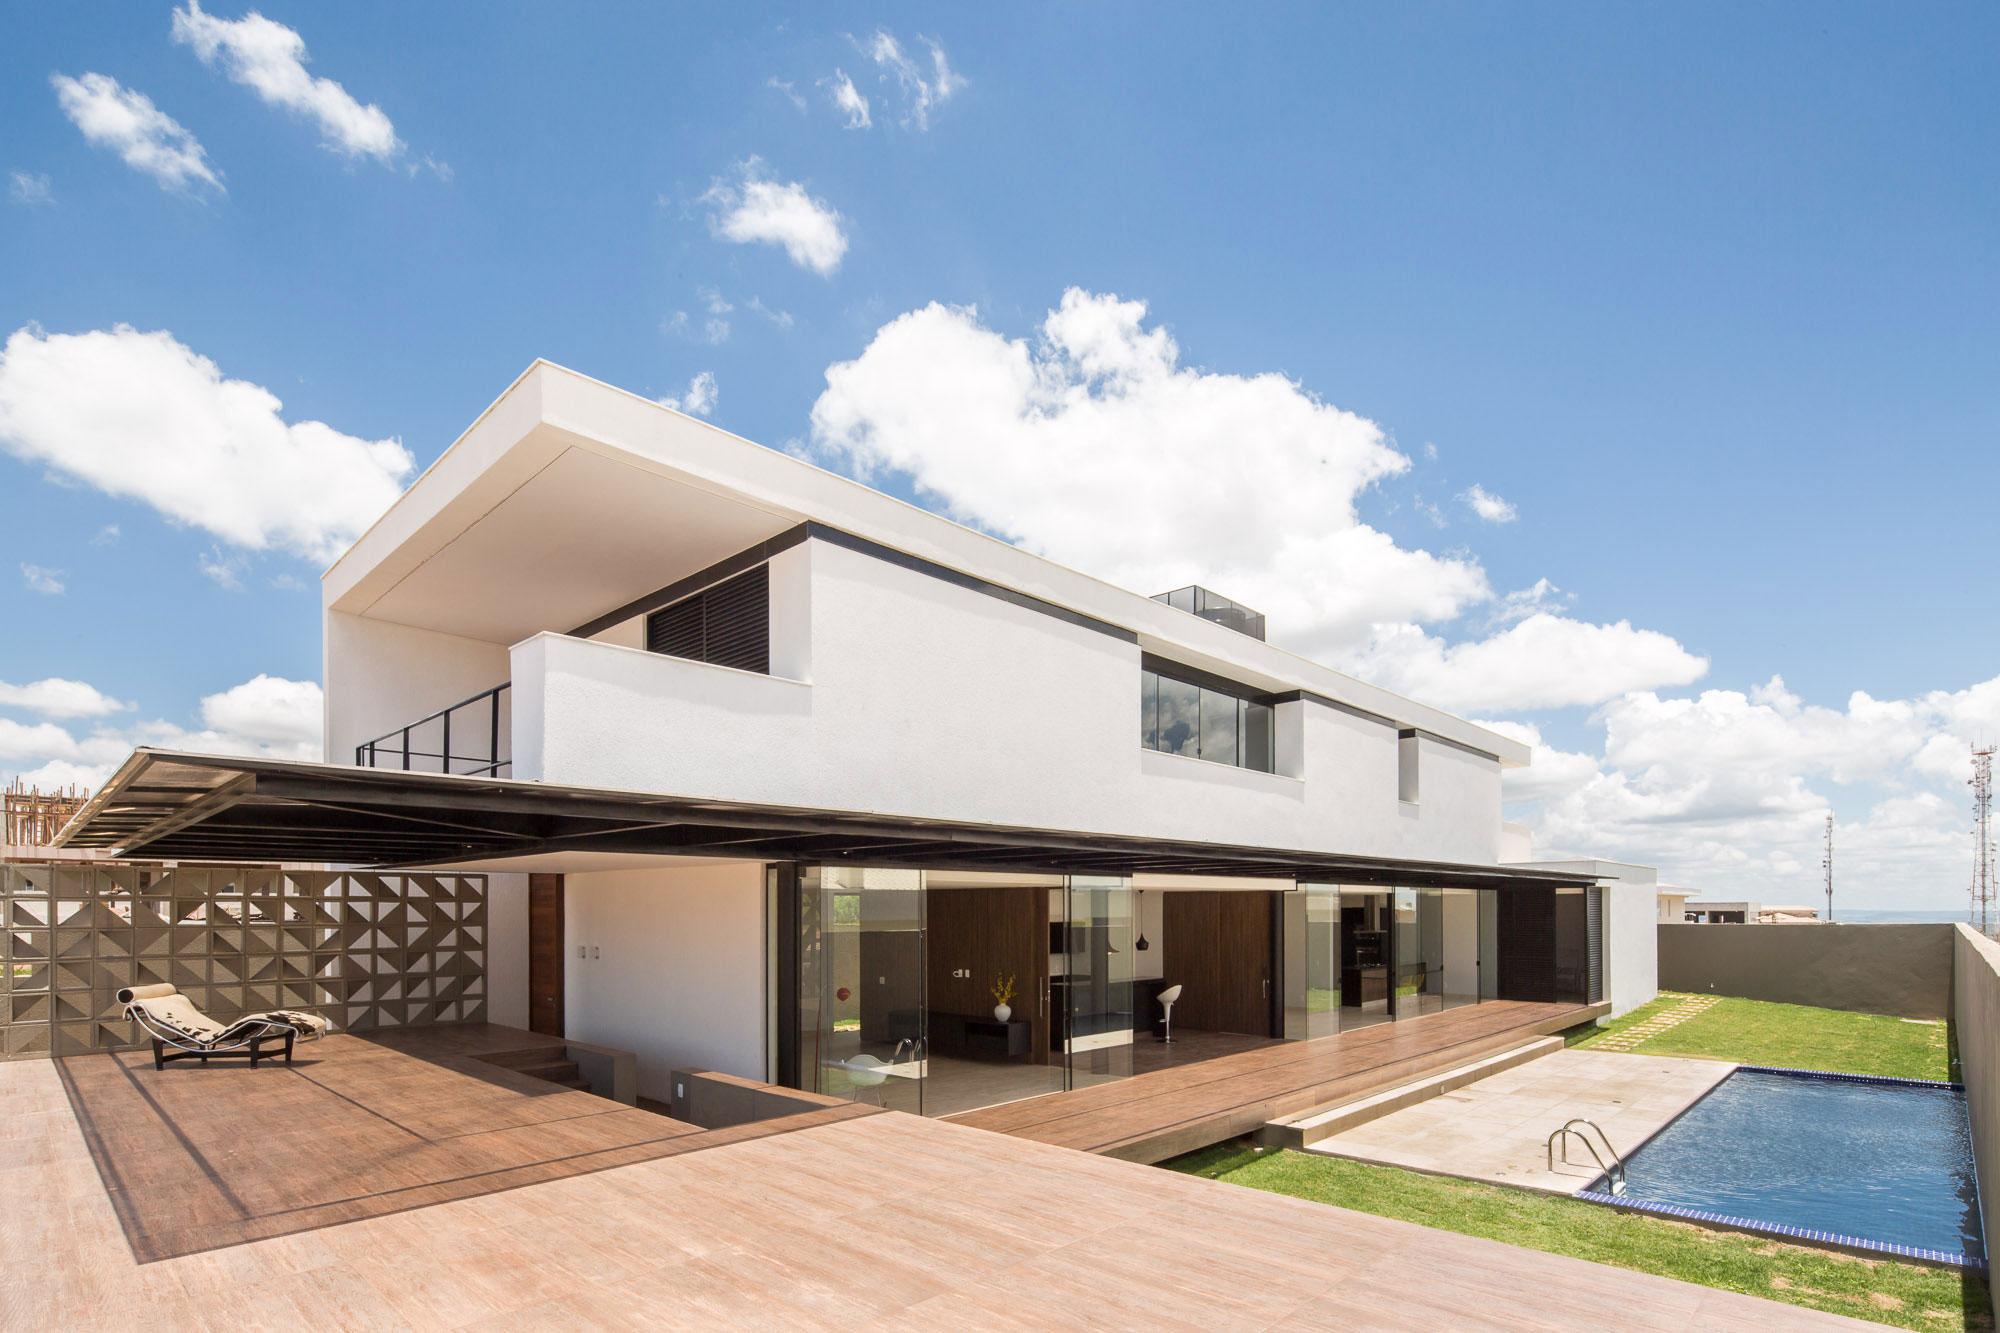 Casa de dos pisos mco house por esquadra yi planos de for Disenos de casas de dos plantas